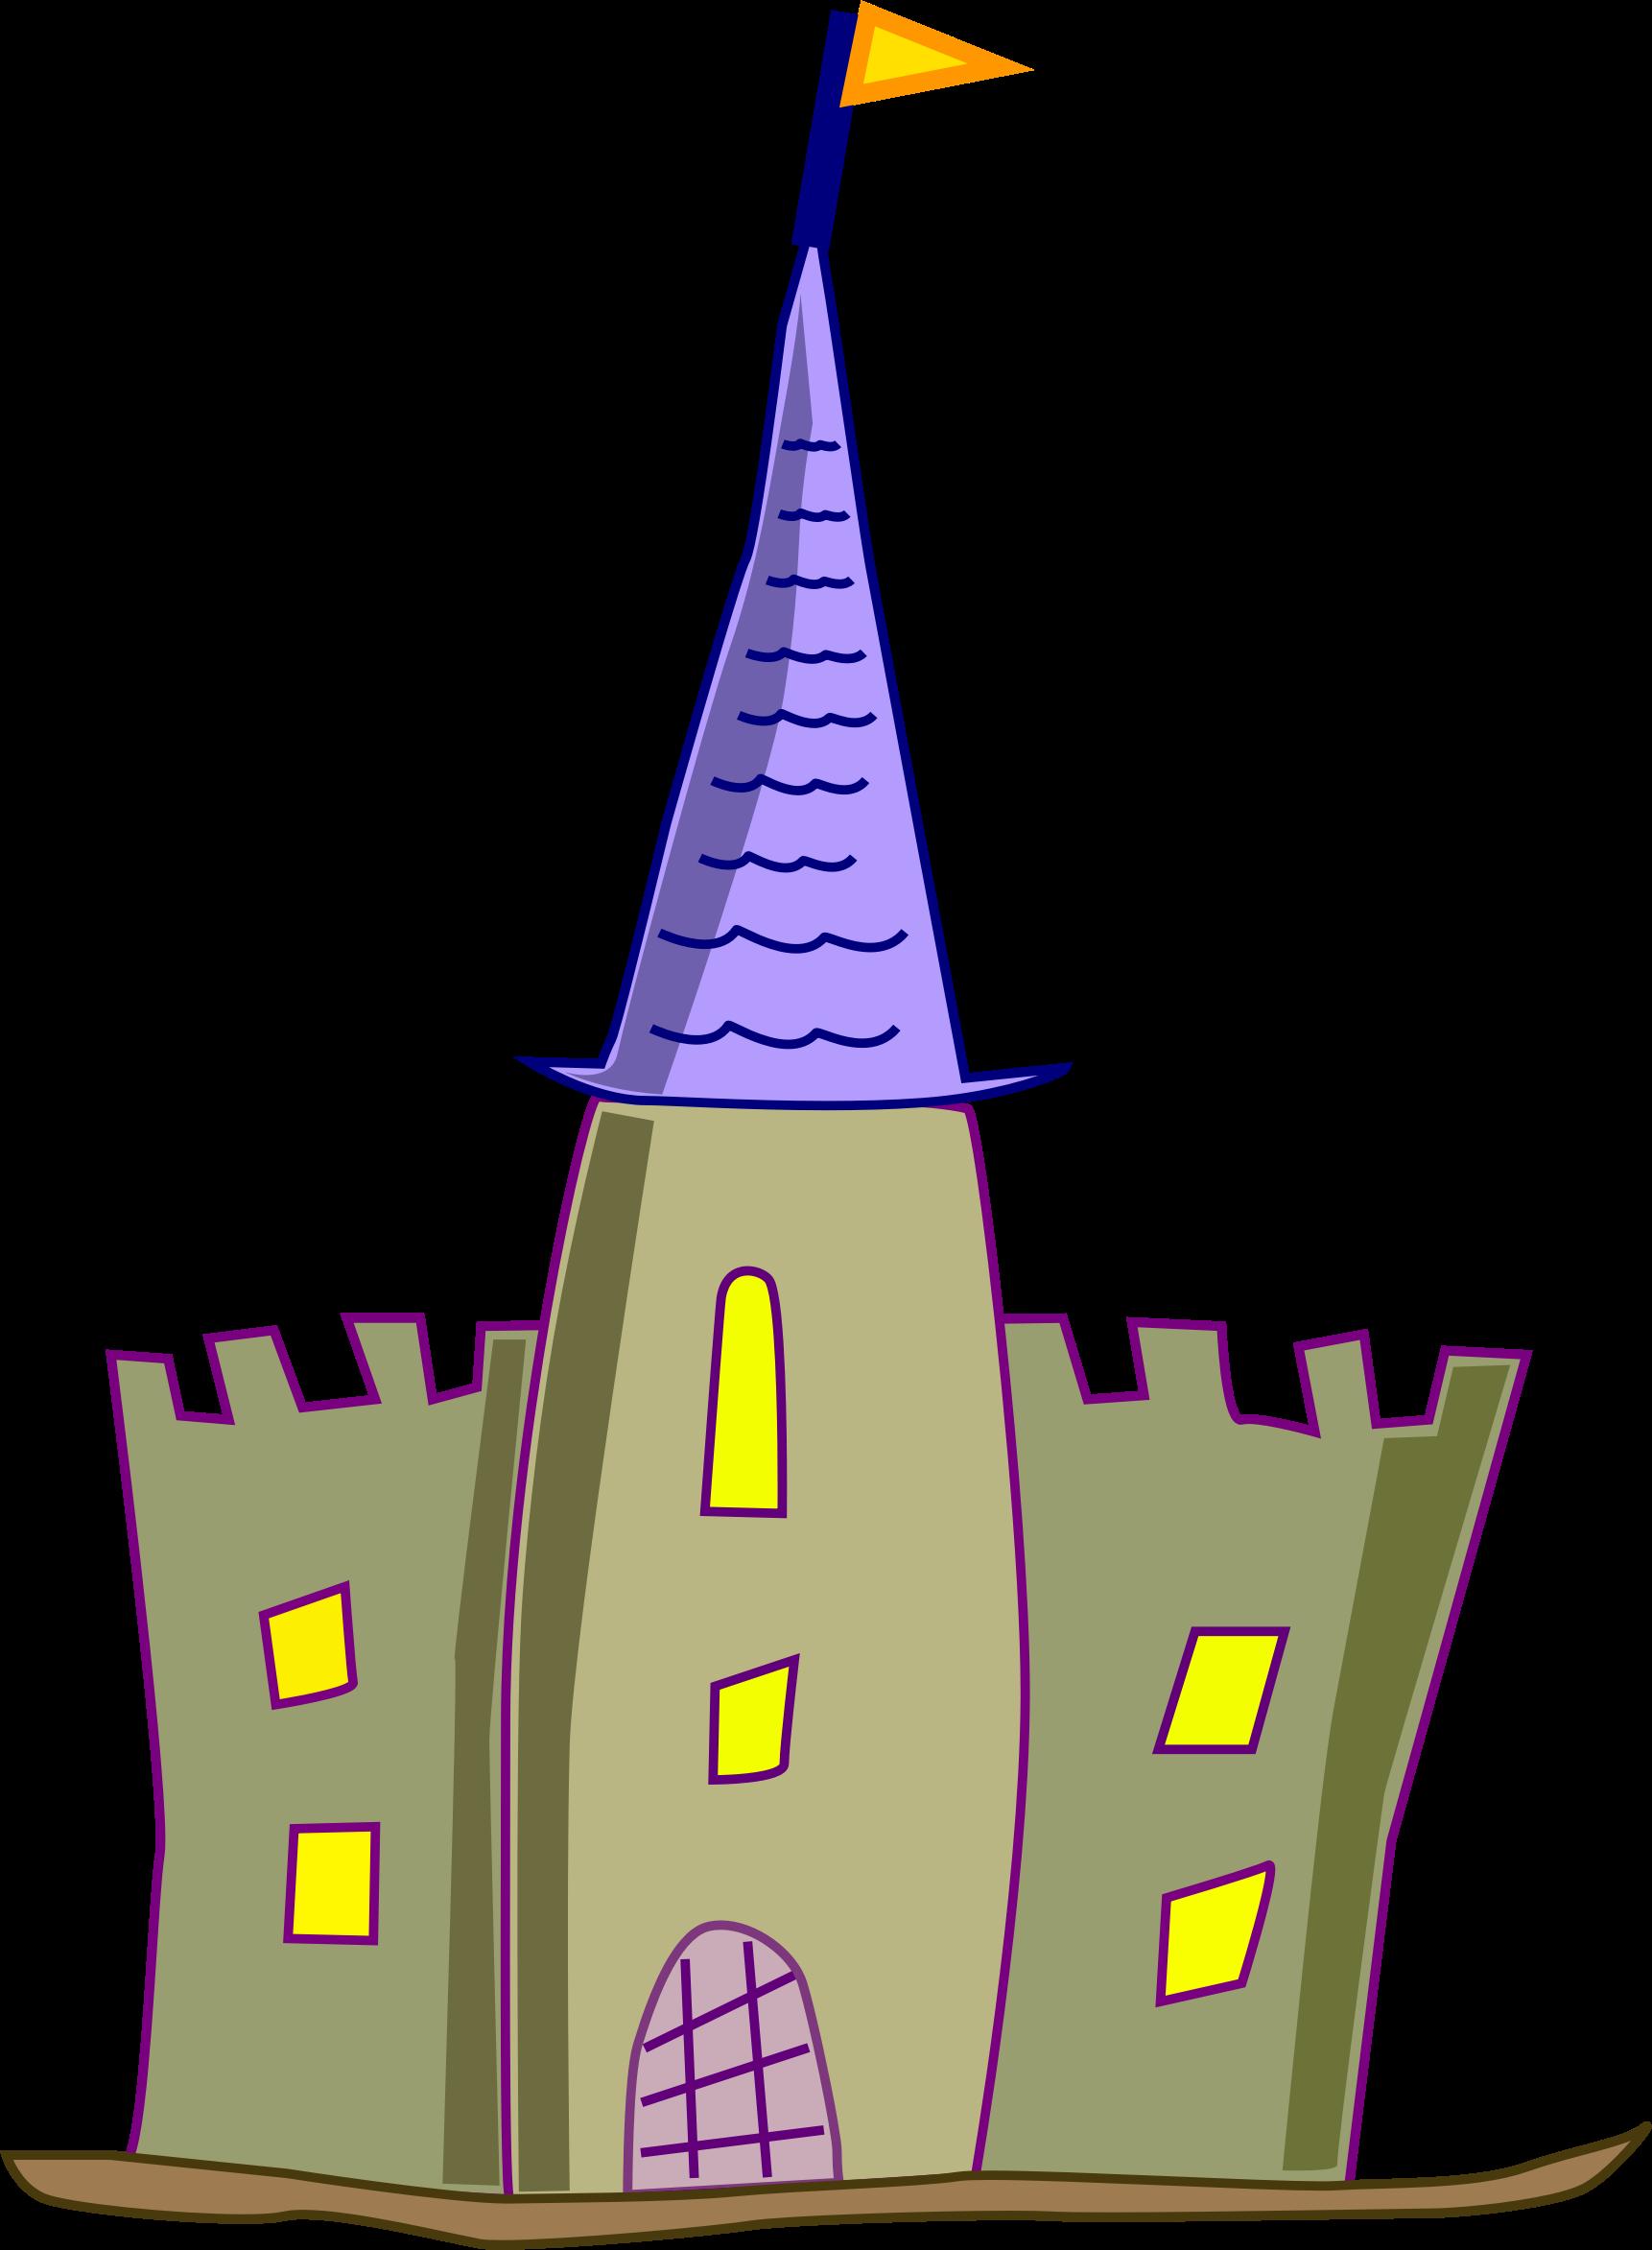 I clipart castle. Big image png